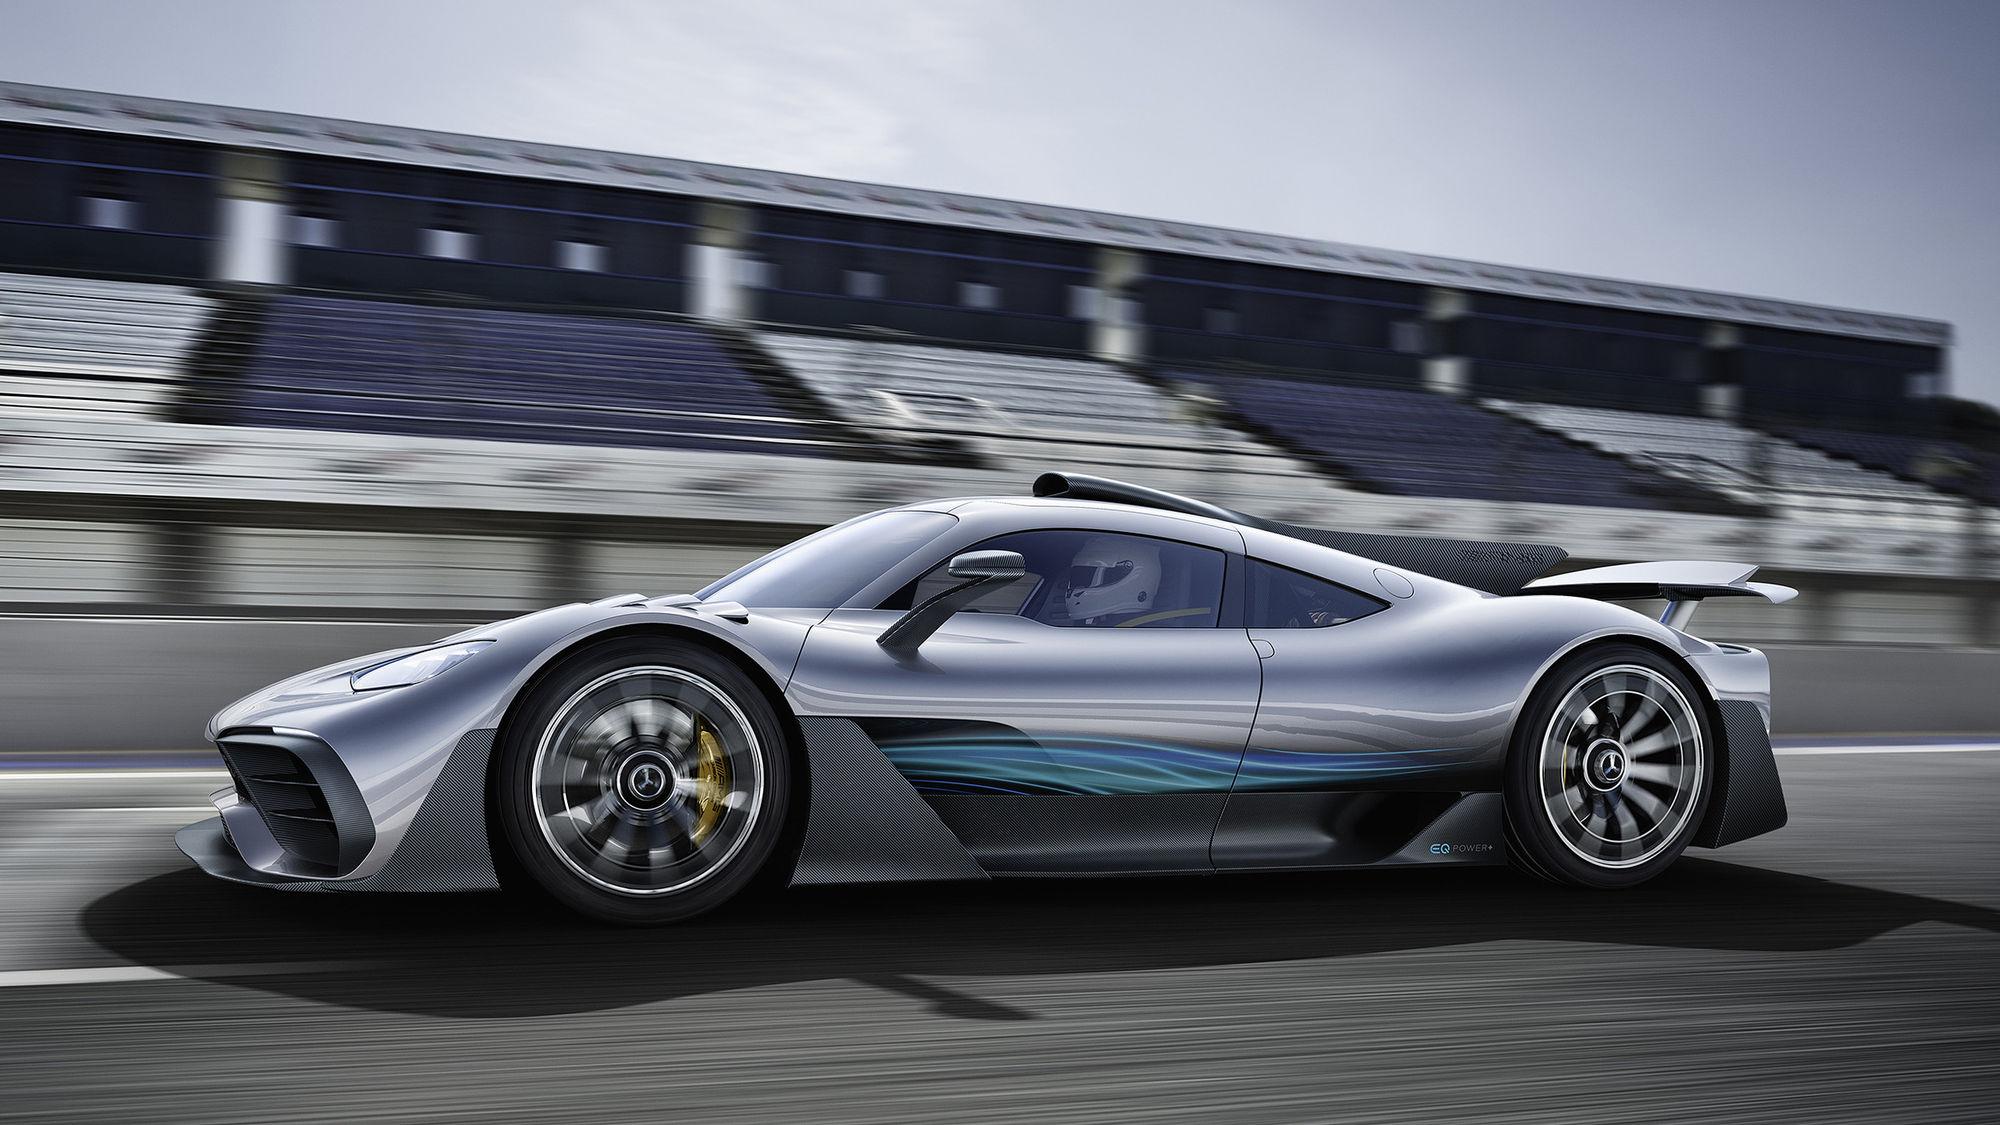 2018 Mercedes-Benz  | Mercedes-AMG Project One Concept Car